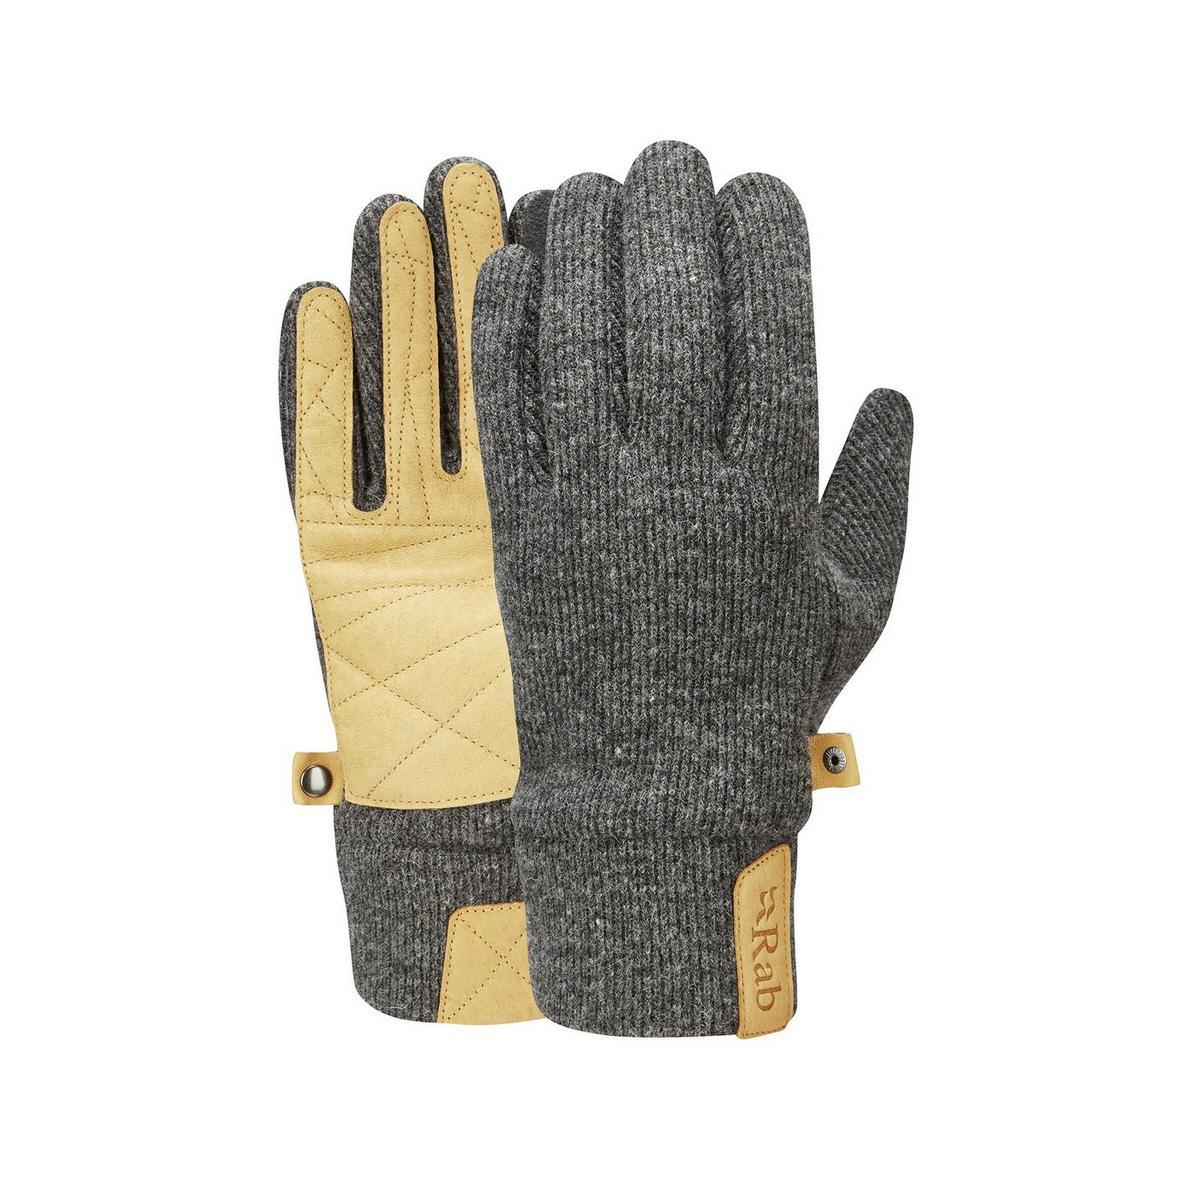 Rab Men's Ridge Glove